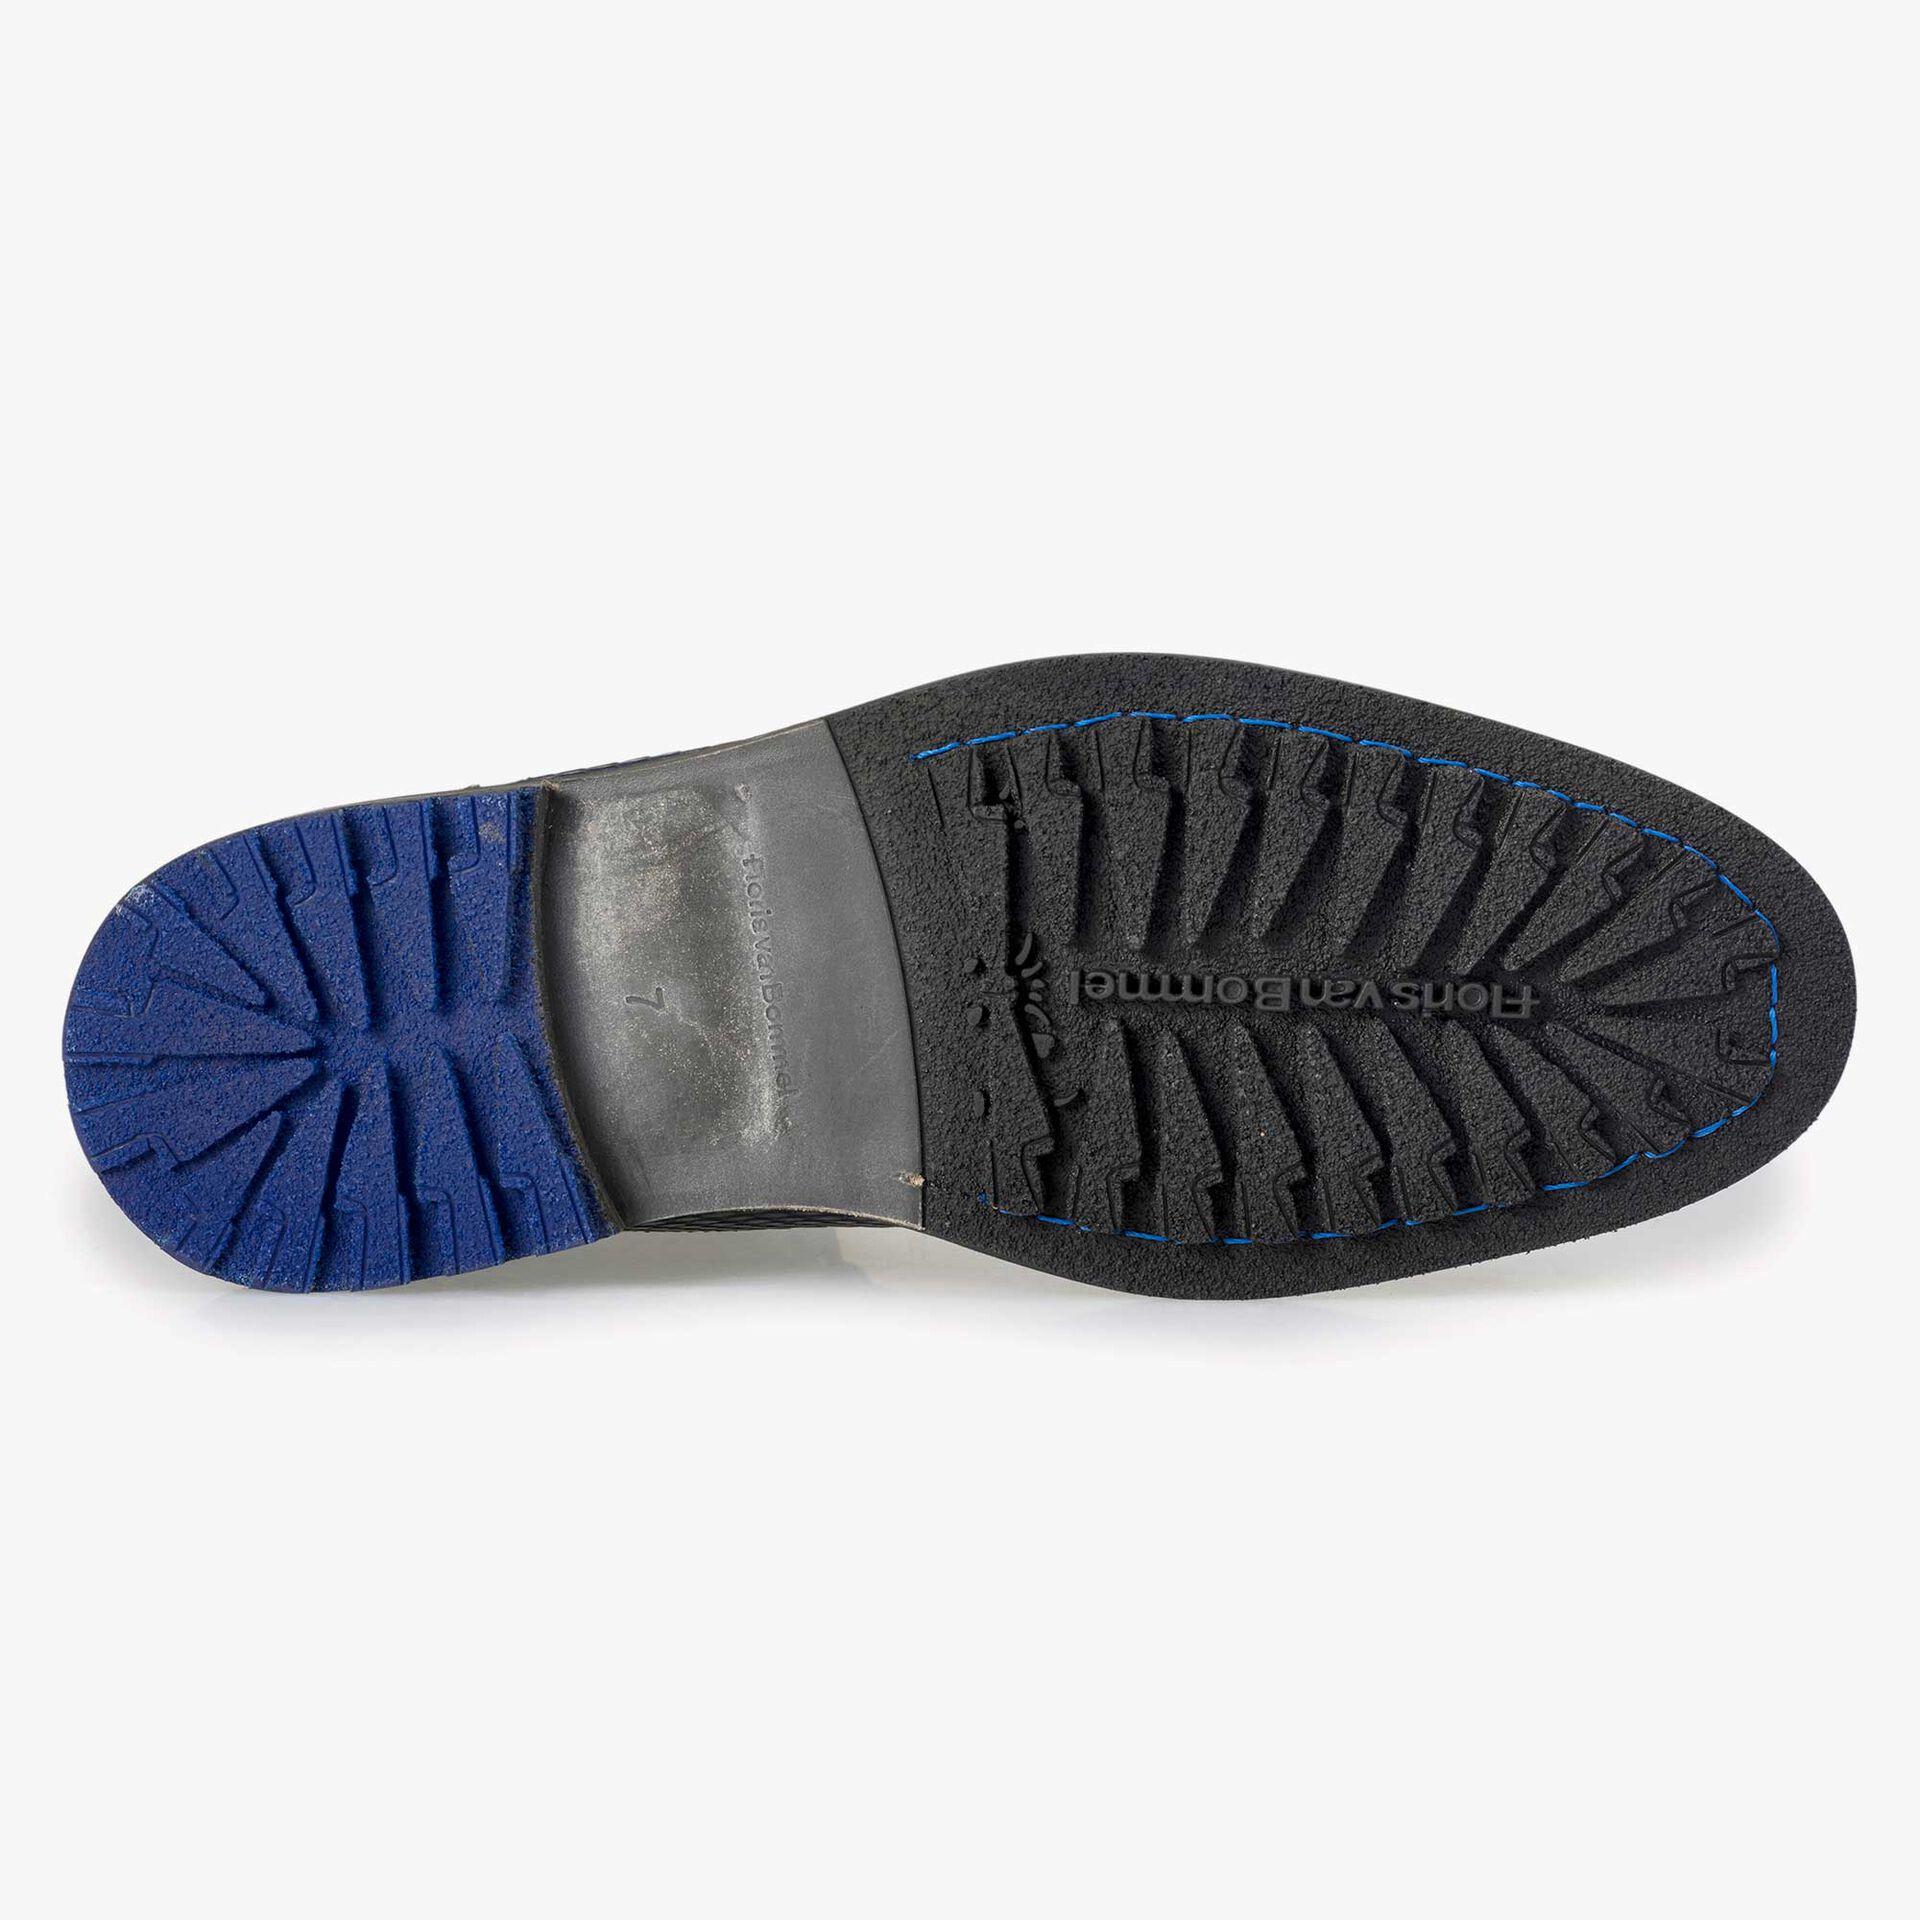 Floris van Bommel dark blue high leather lace boot